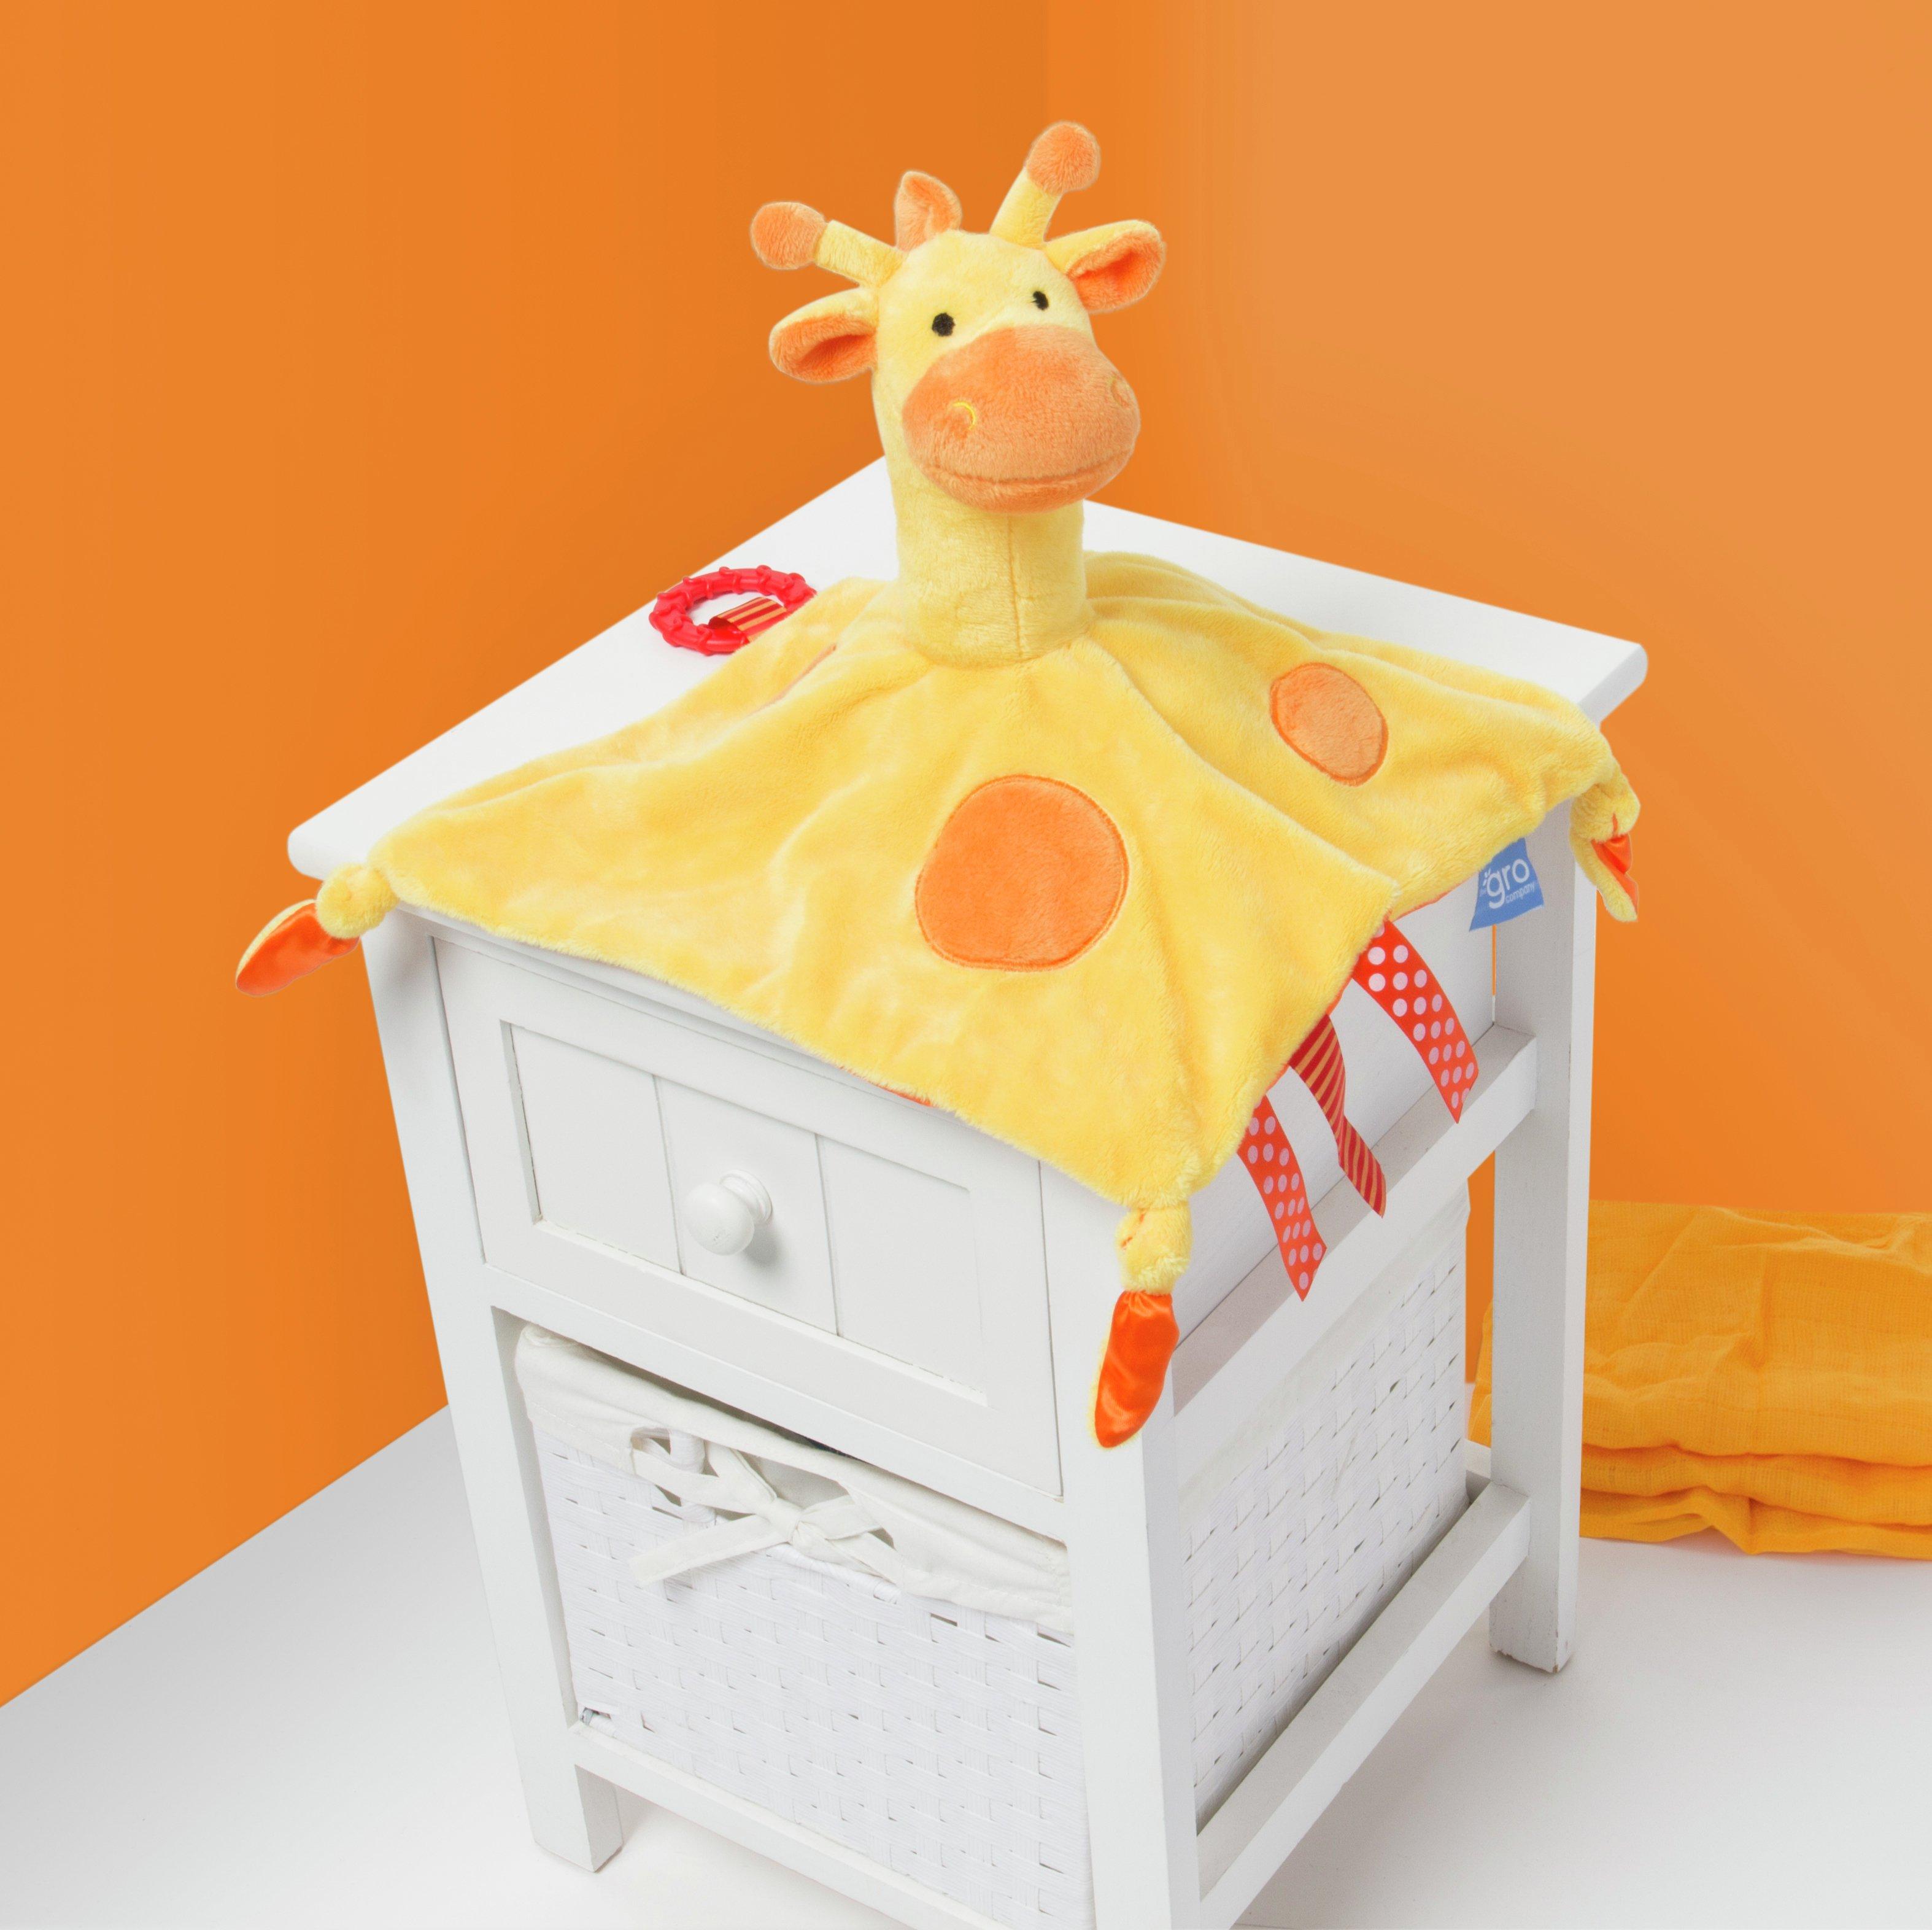 gro comforter gerri giraffe.